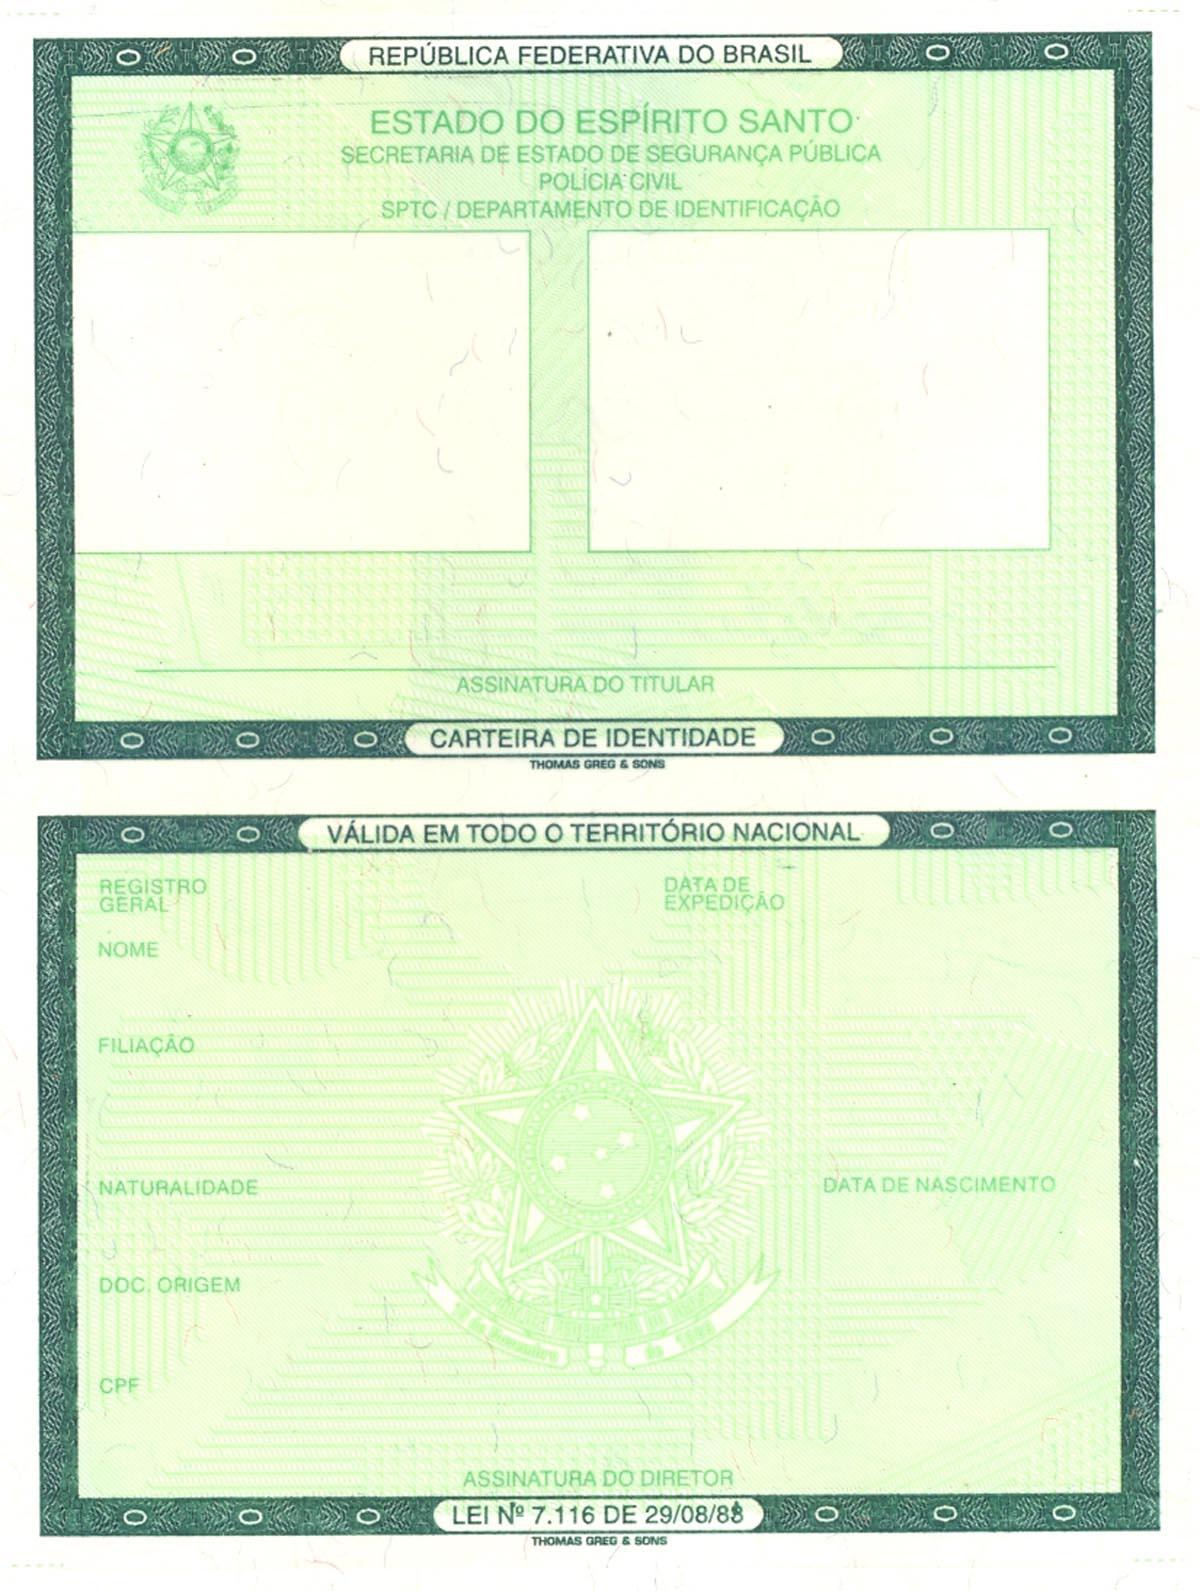 national identity document china expired use on application